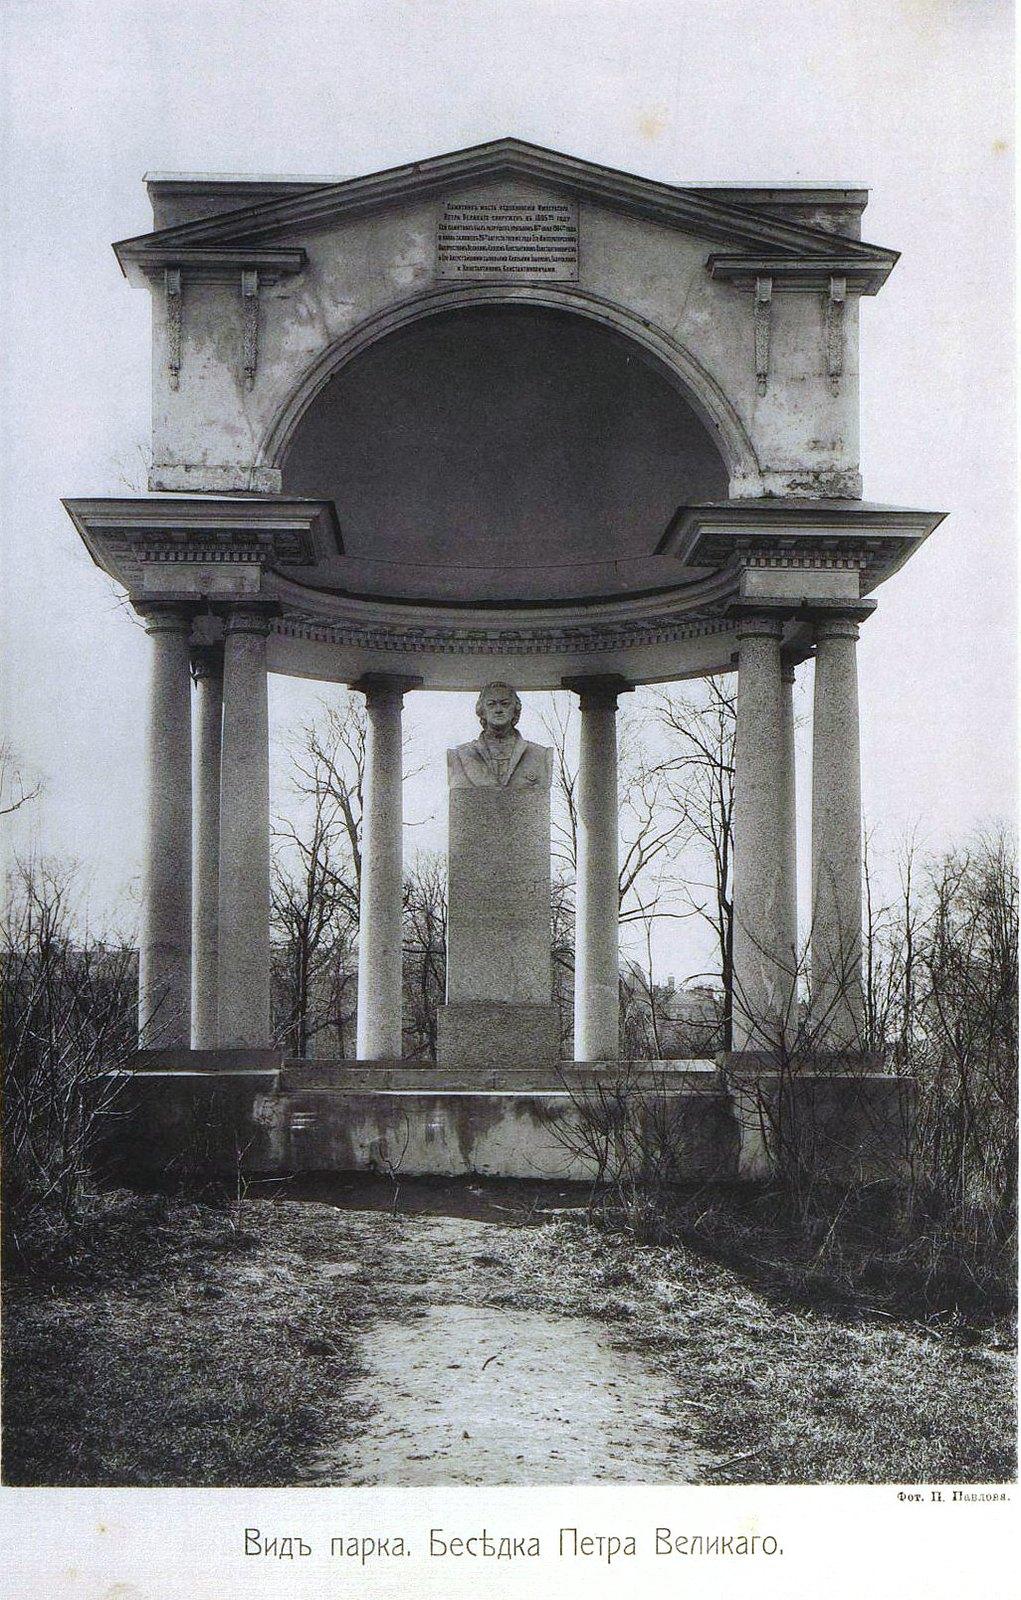 50. Вид парка. Беседка Петра Великого